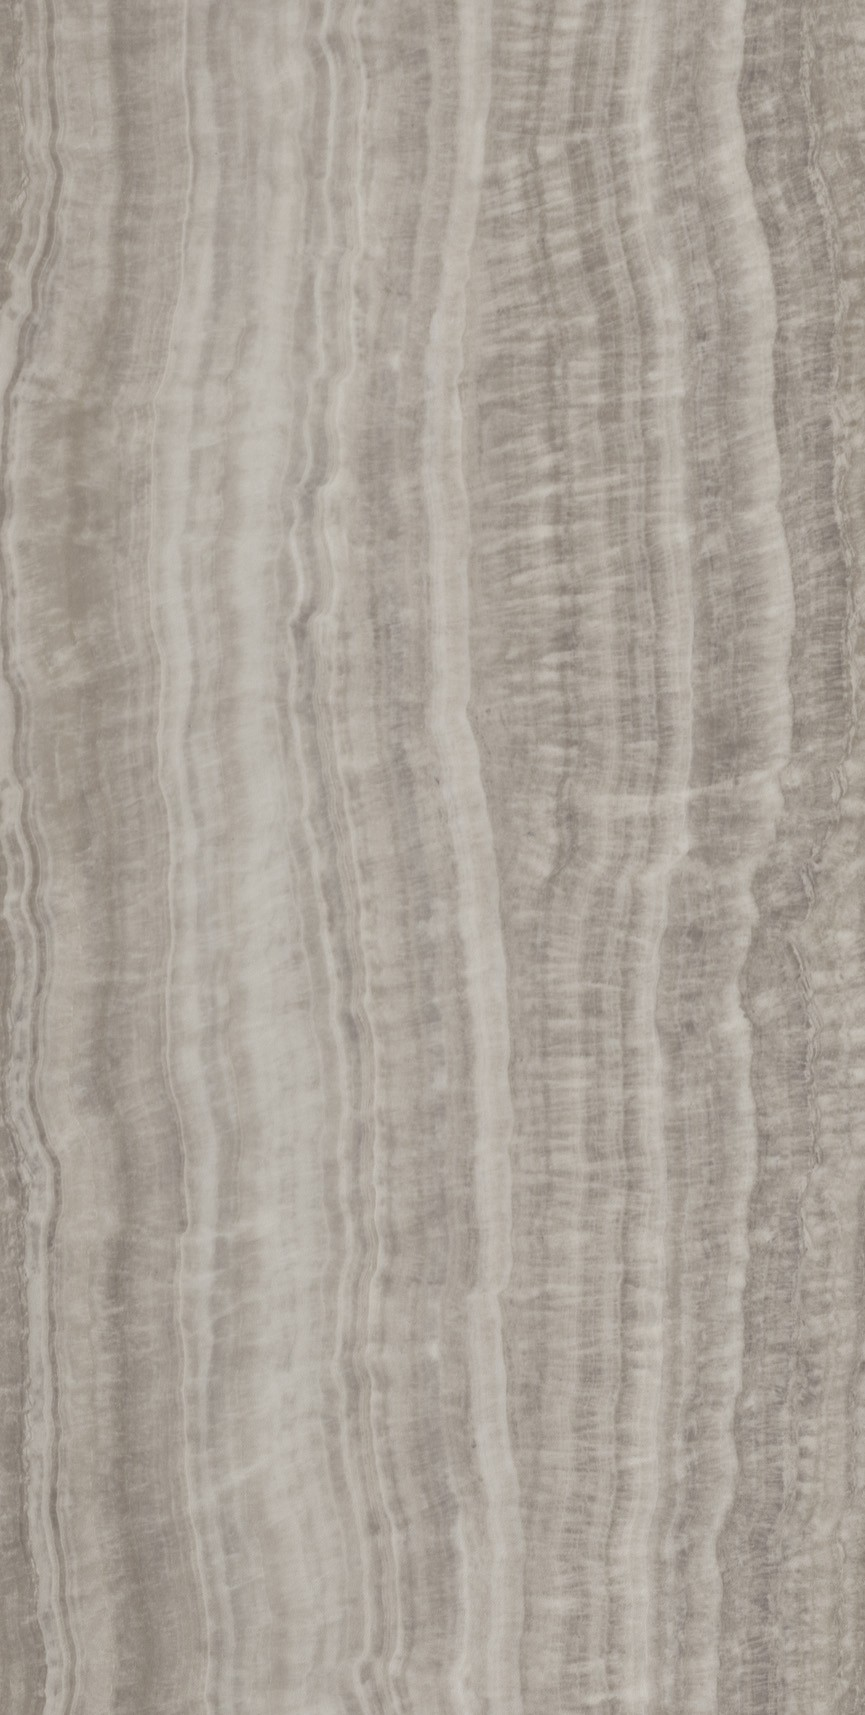 klick vinyl marmor beste bildideen zu hause design. Black Bedroom Furniture Sets. Home Design Ideas